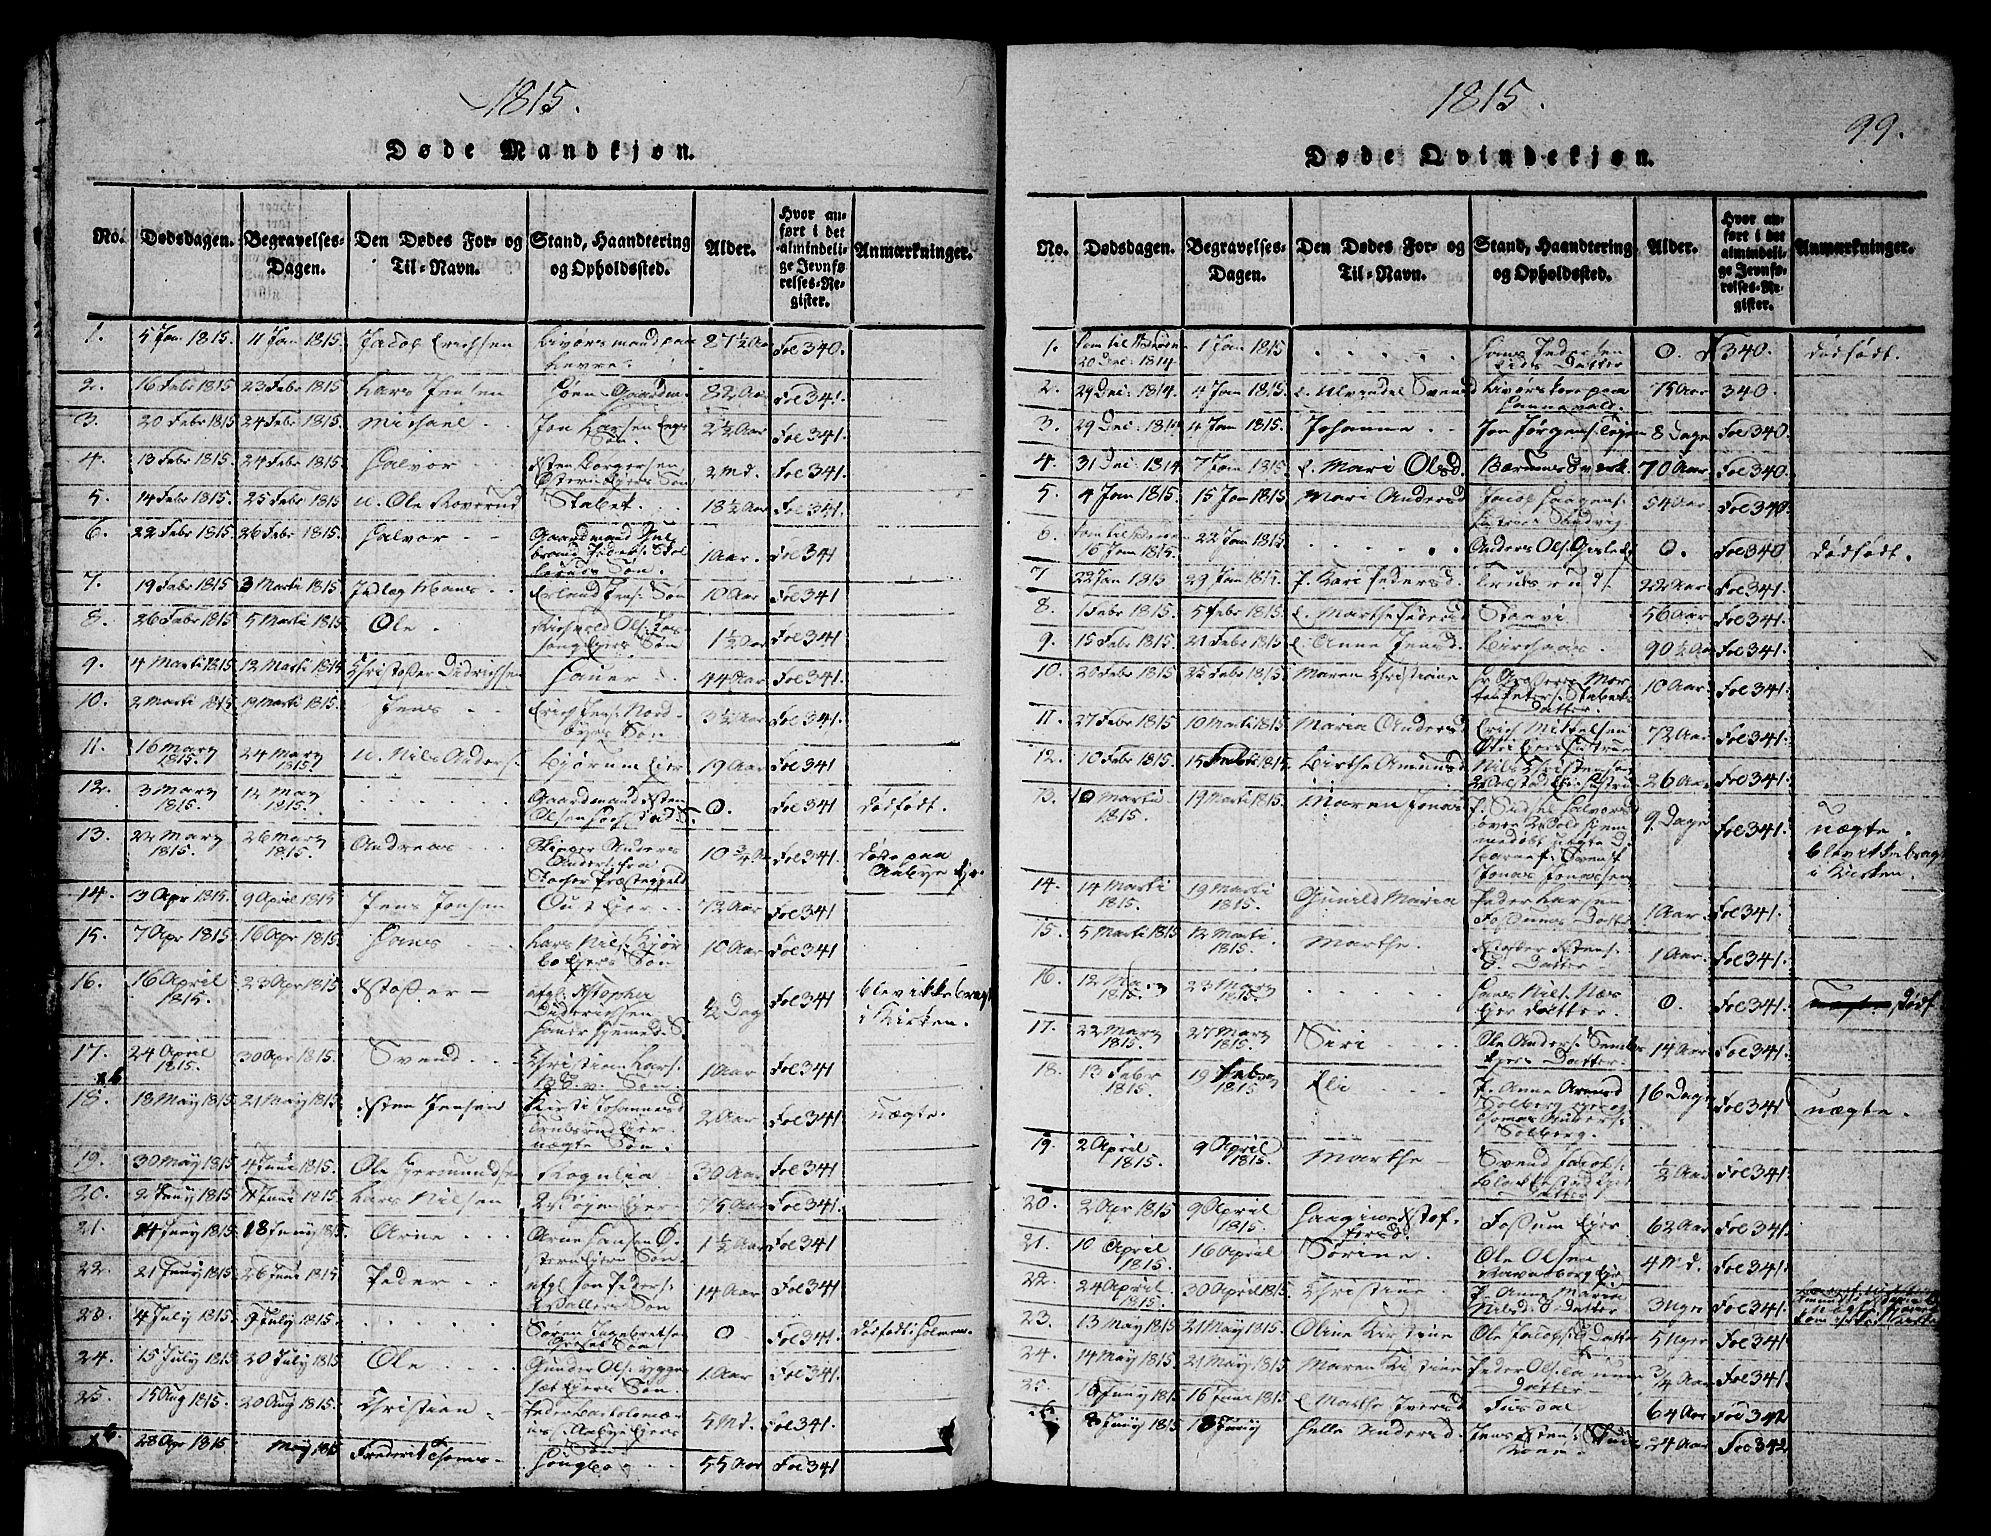 SAO, Asker prestekontor Kirkebøker, G/Ga/L0001: Klokkerbok nr. I 1, 1814-1830, s. 99